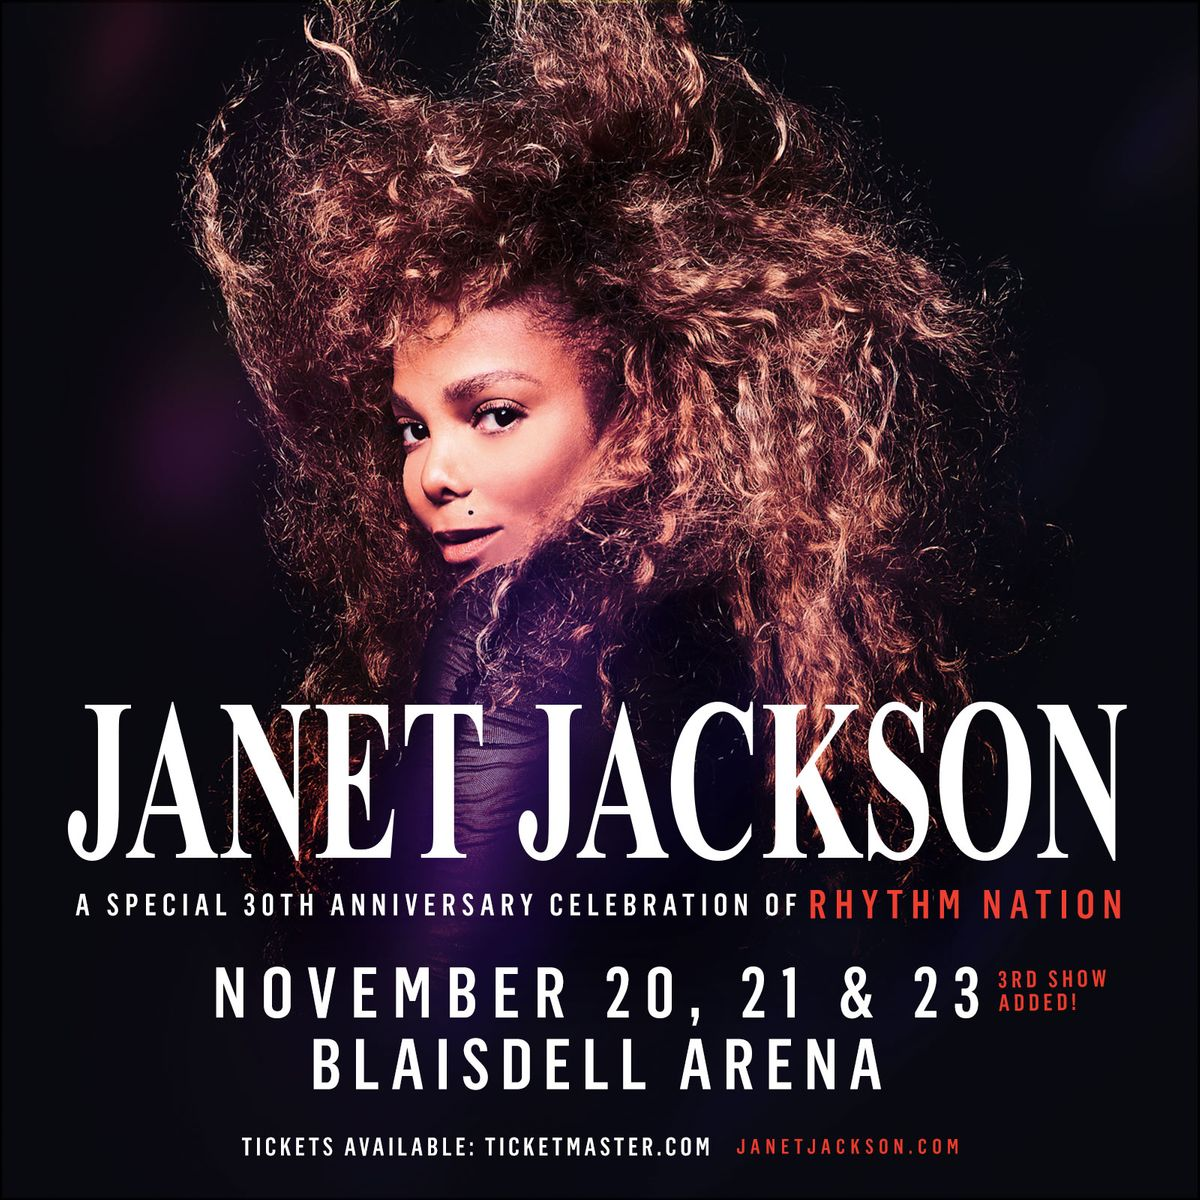 JanetJackson_ig_1600x1600_3rdShow.jpg